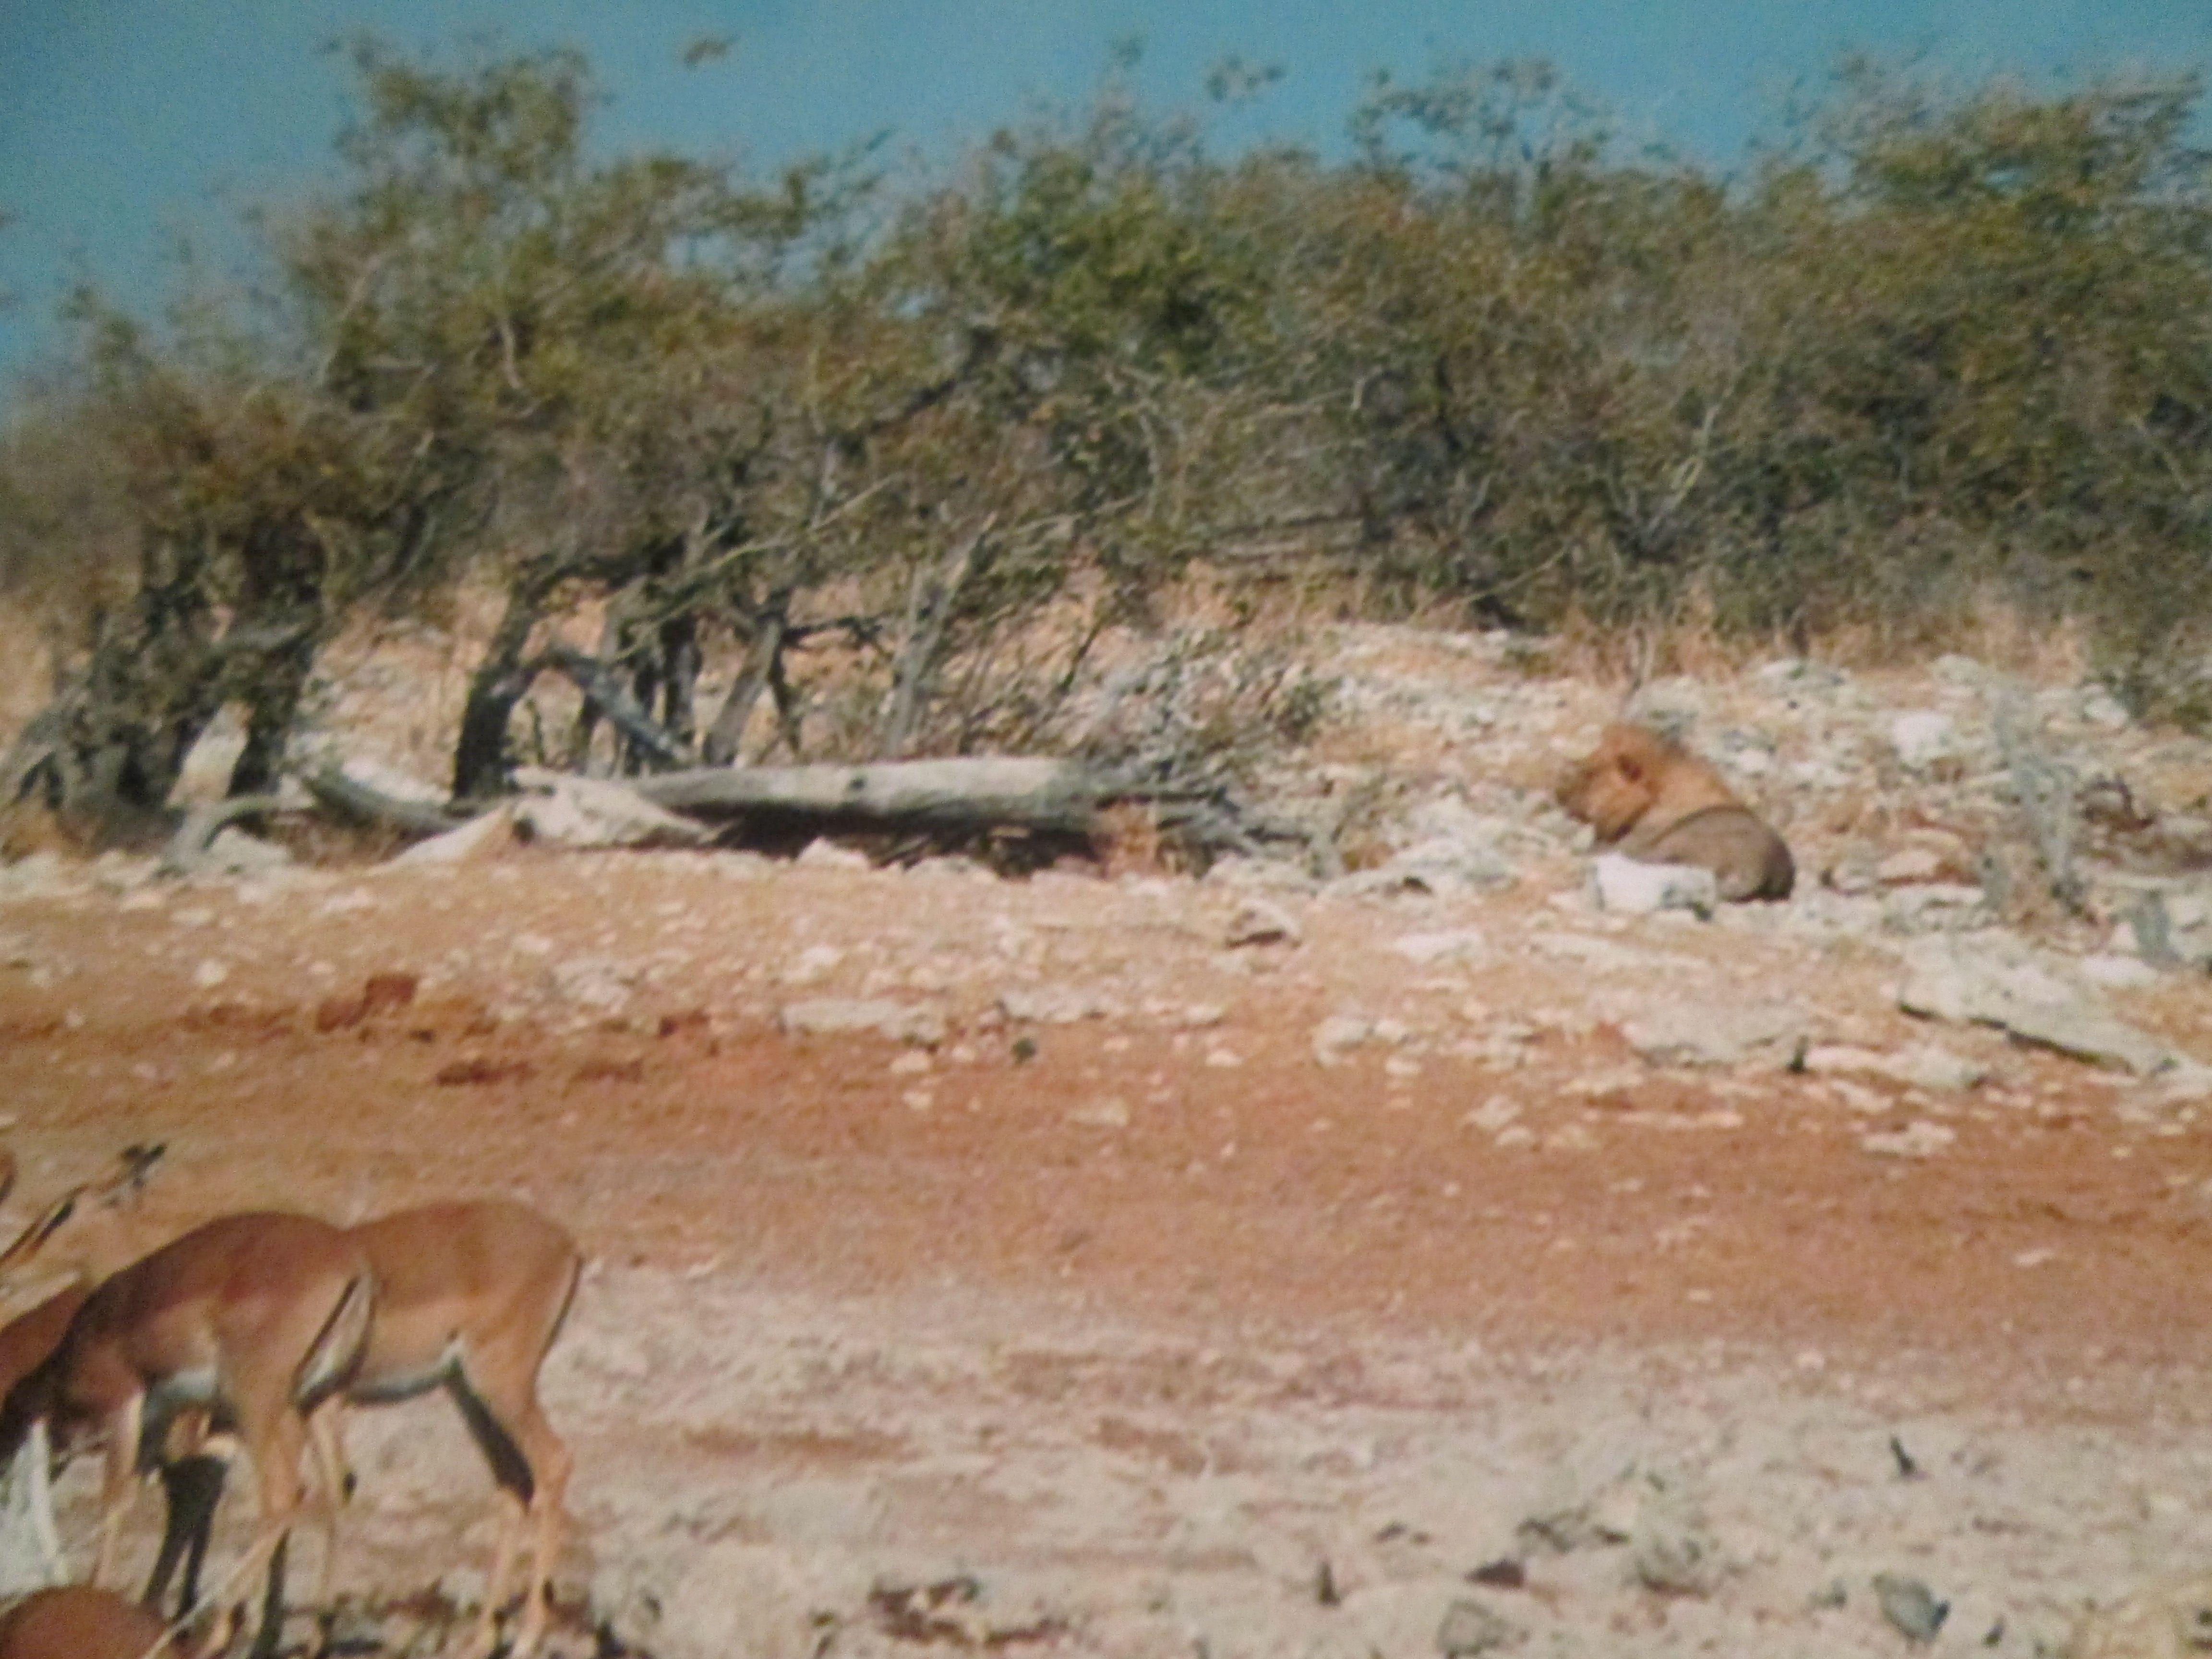 Löwe im Etoscha Nationalpark 2004